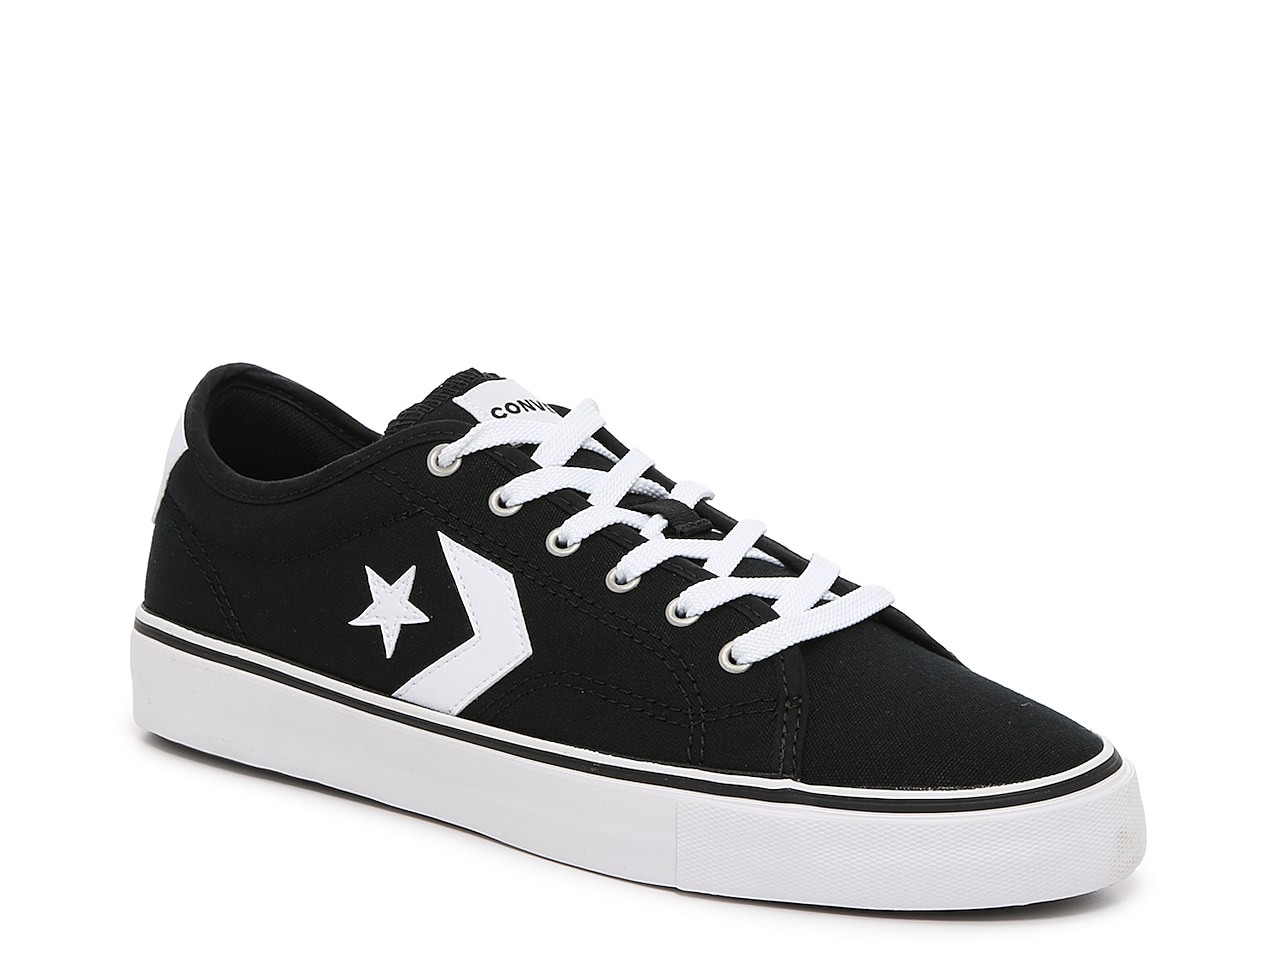 Converse Boulevard Sneaker - Men's